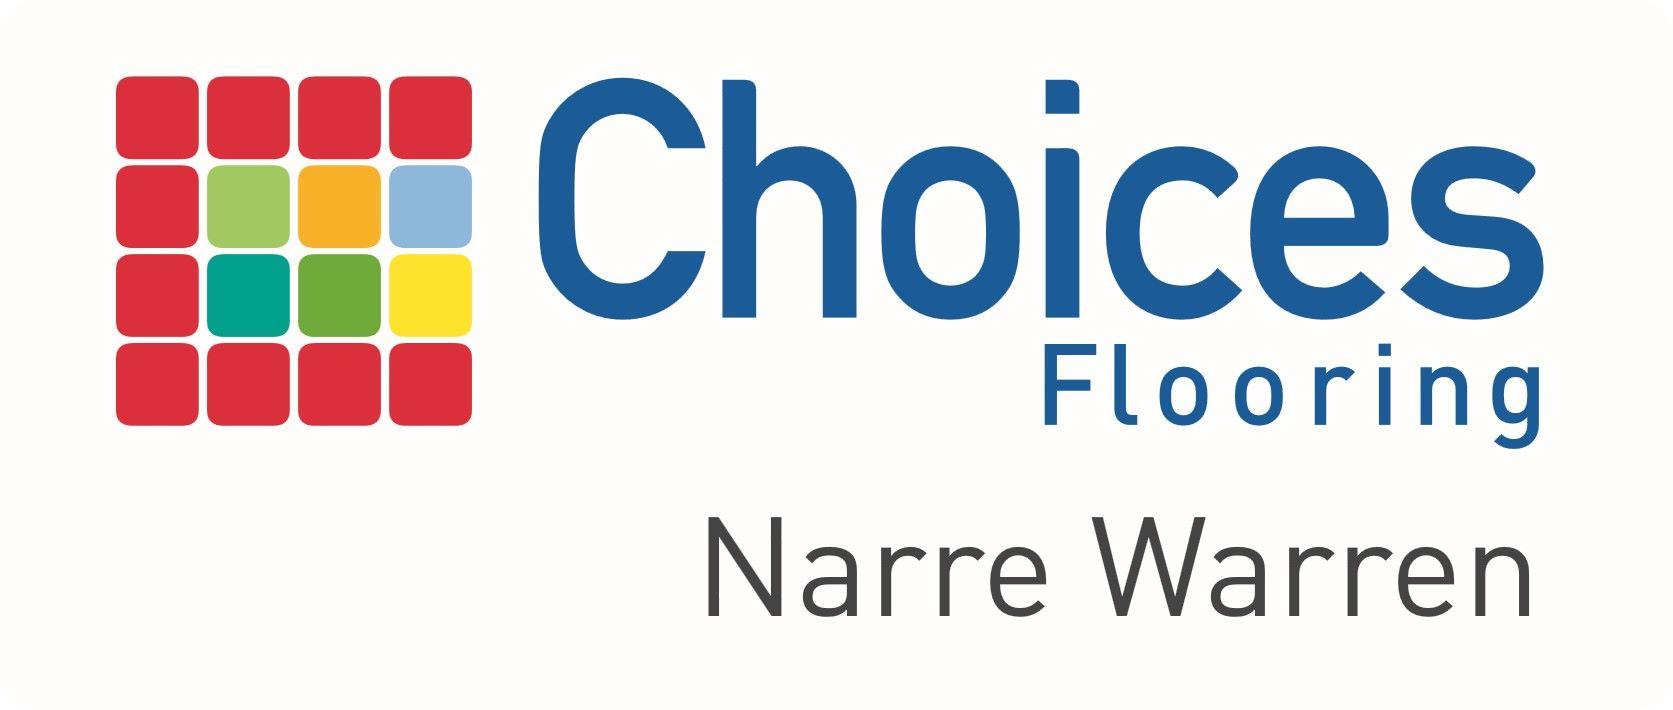 Choices Flooring Narre warren Logo